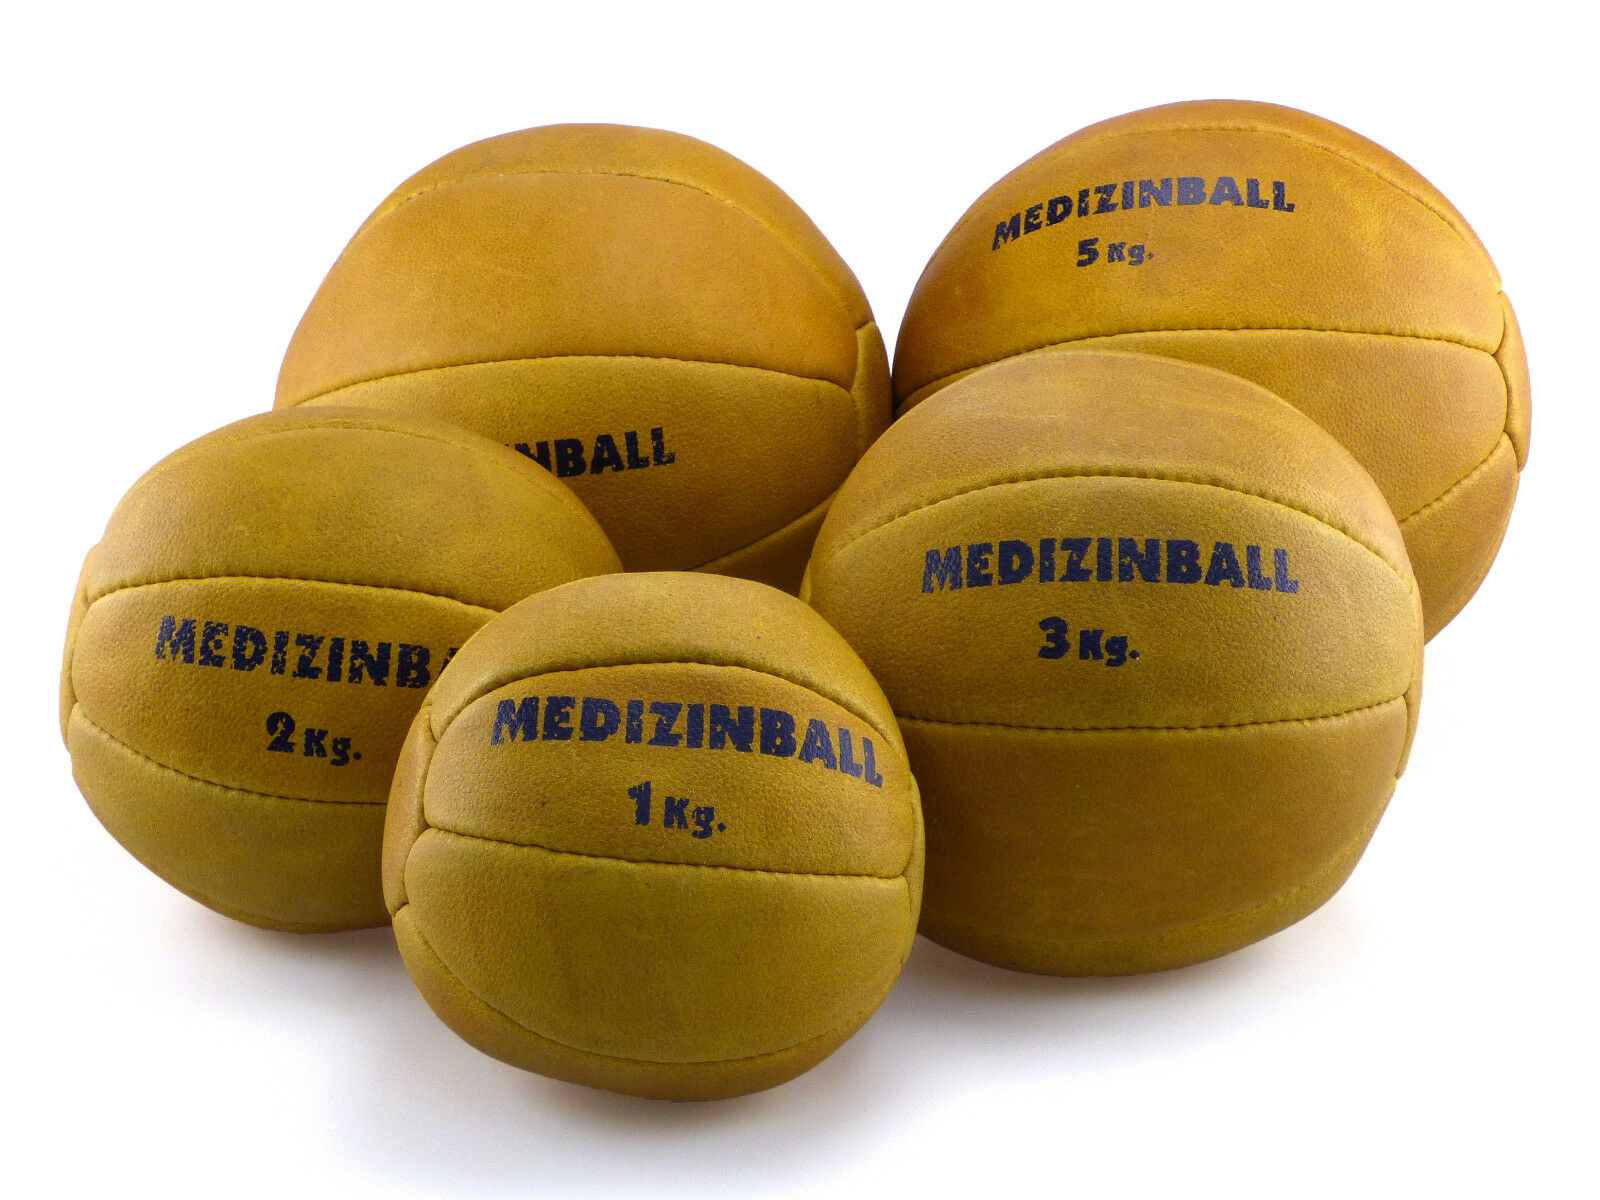 Medizinball Gymnastikball Rehaball Fitnessball Gewichtsball 1 - 5 KG Echtleder